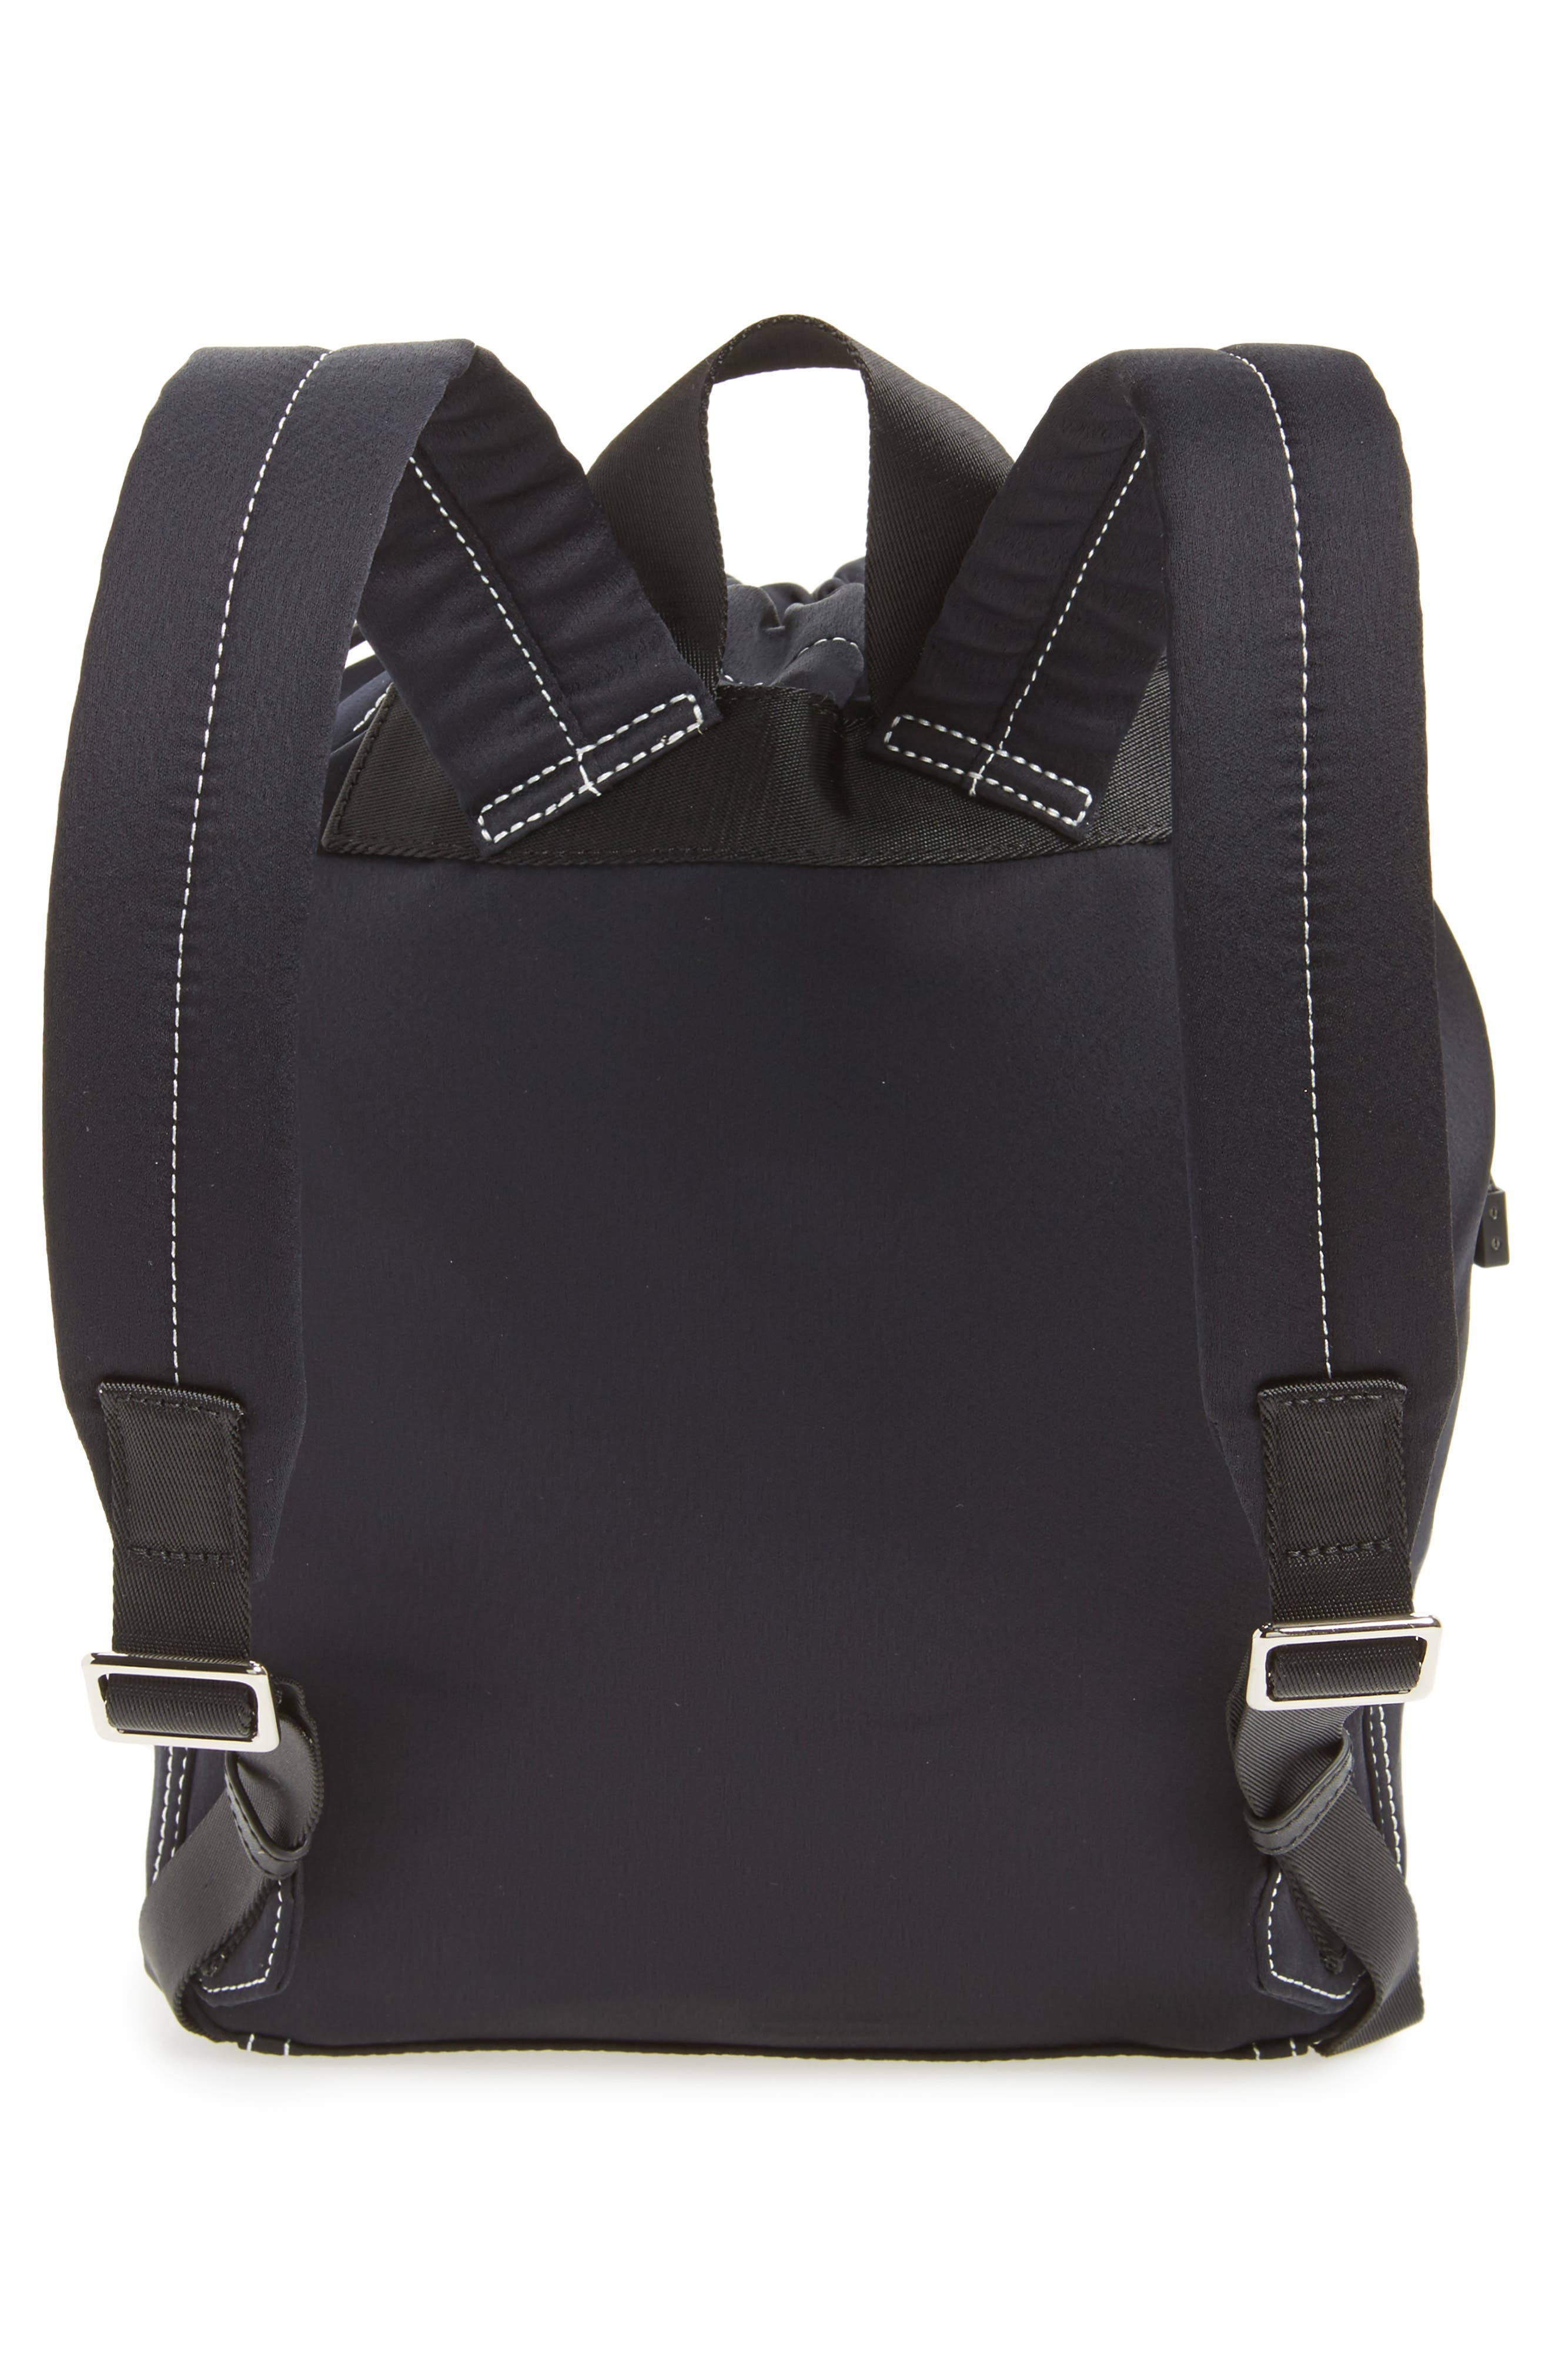 Phillip Lim 3.1 Medium Go-Go Embellished Backpack,                             Alternate thumbnail 6, color,